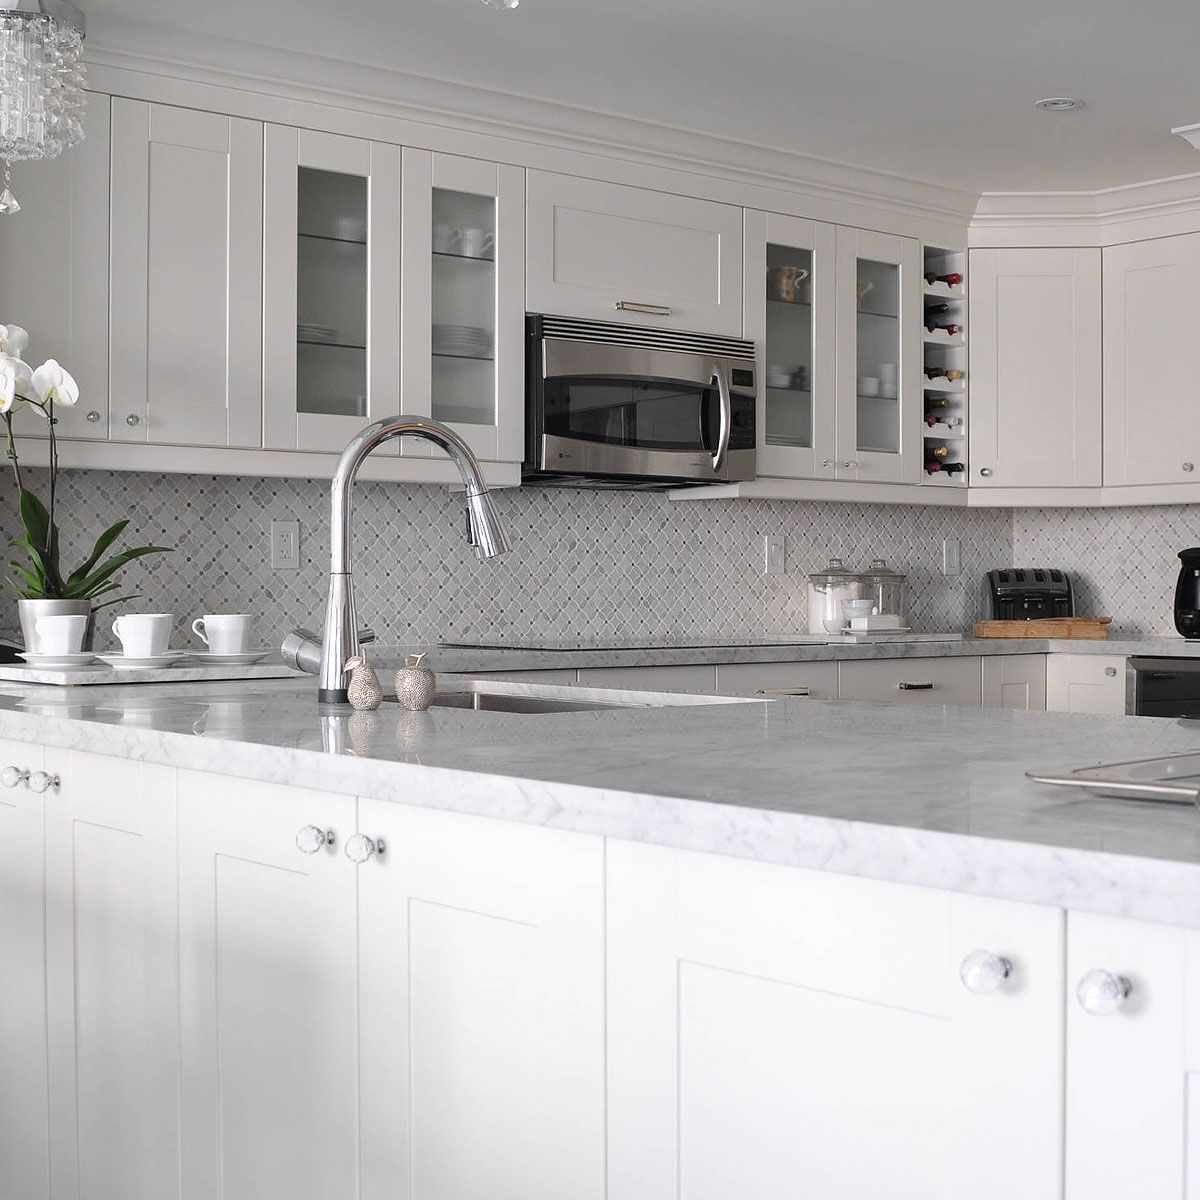 - White Gray Marble Flower Mosaic Tile Backsplash.com Kitchen